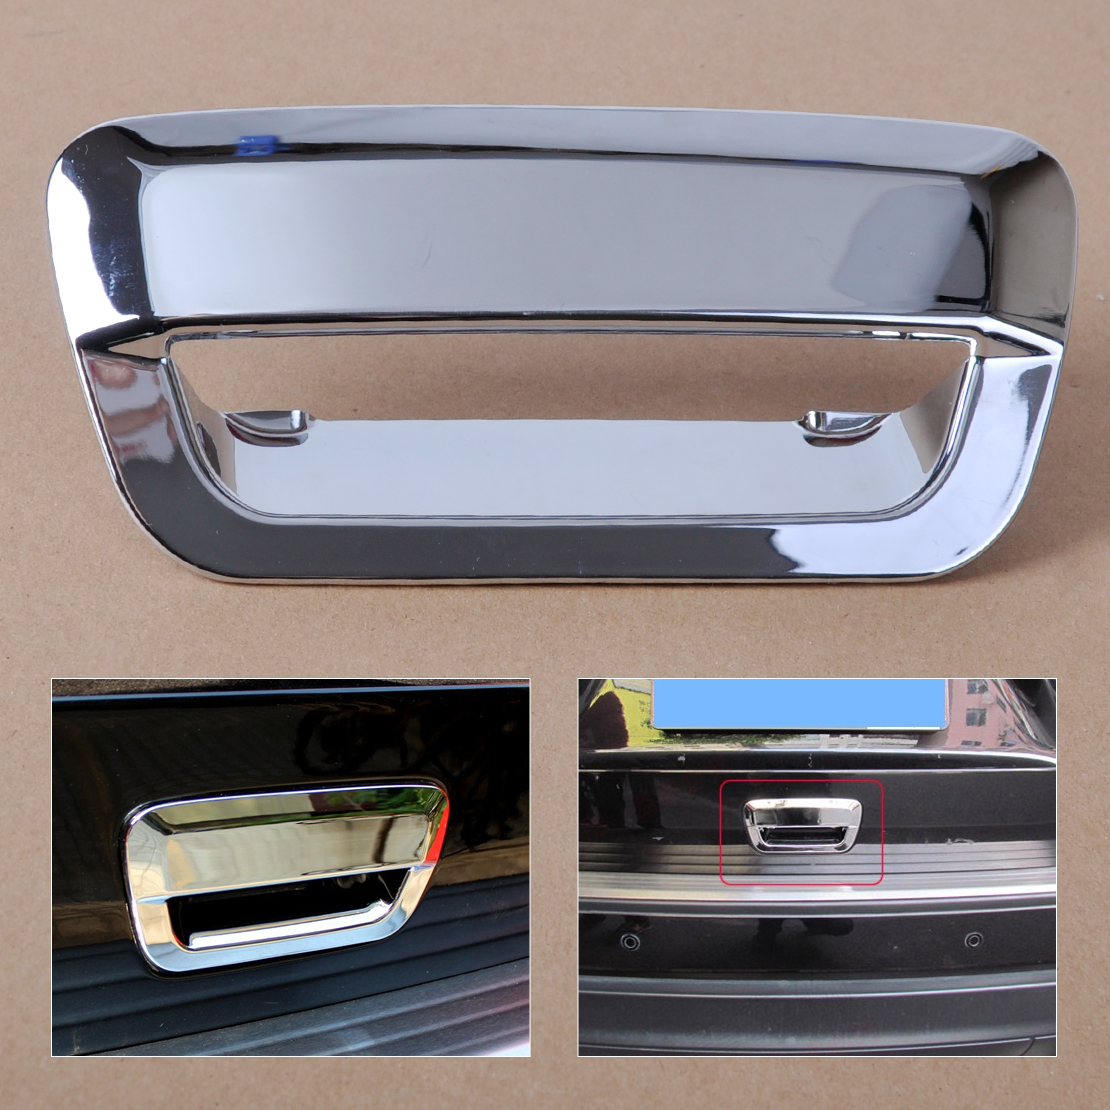 Jeep Grand Cherokee WJ 3.1 1999-04 interior wing mirror screw hole cover